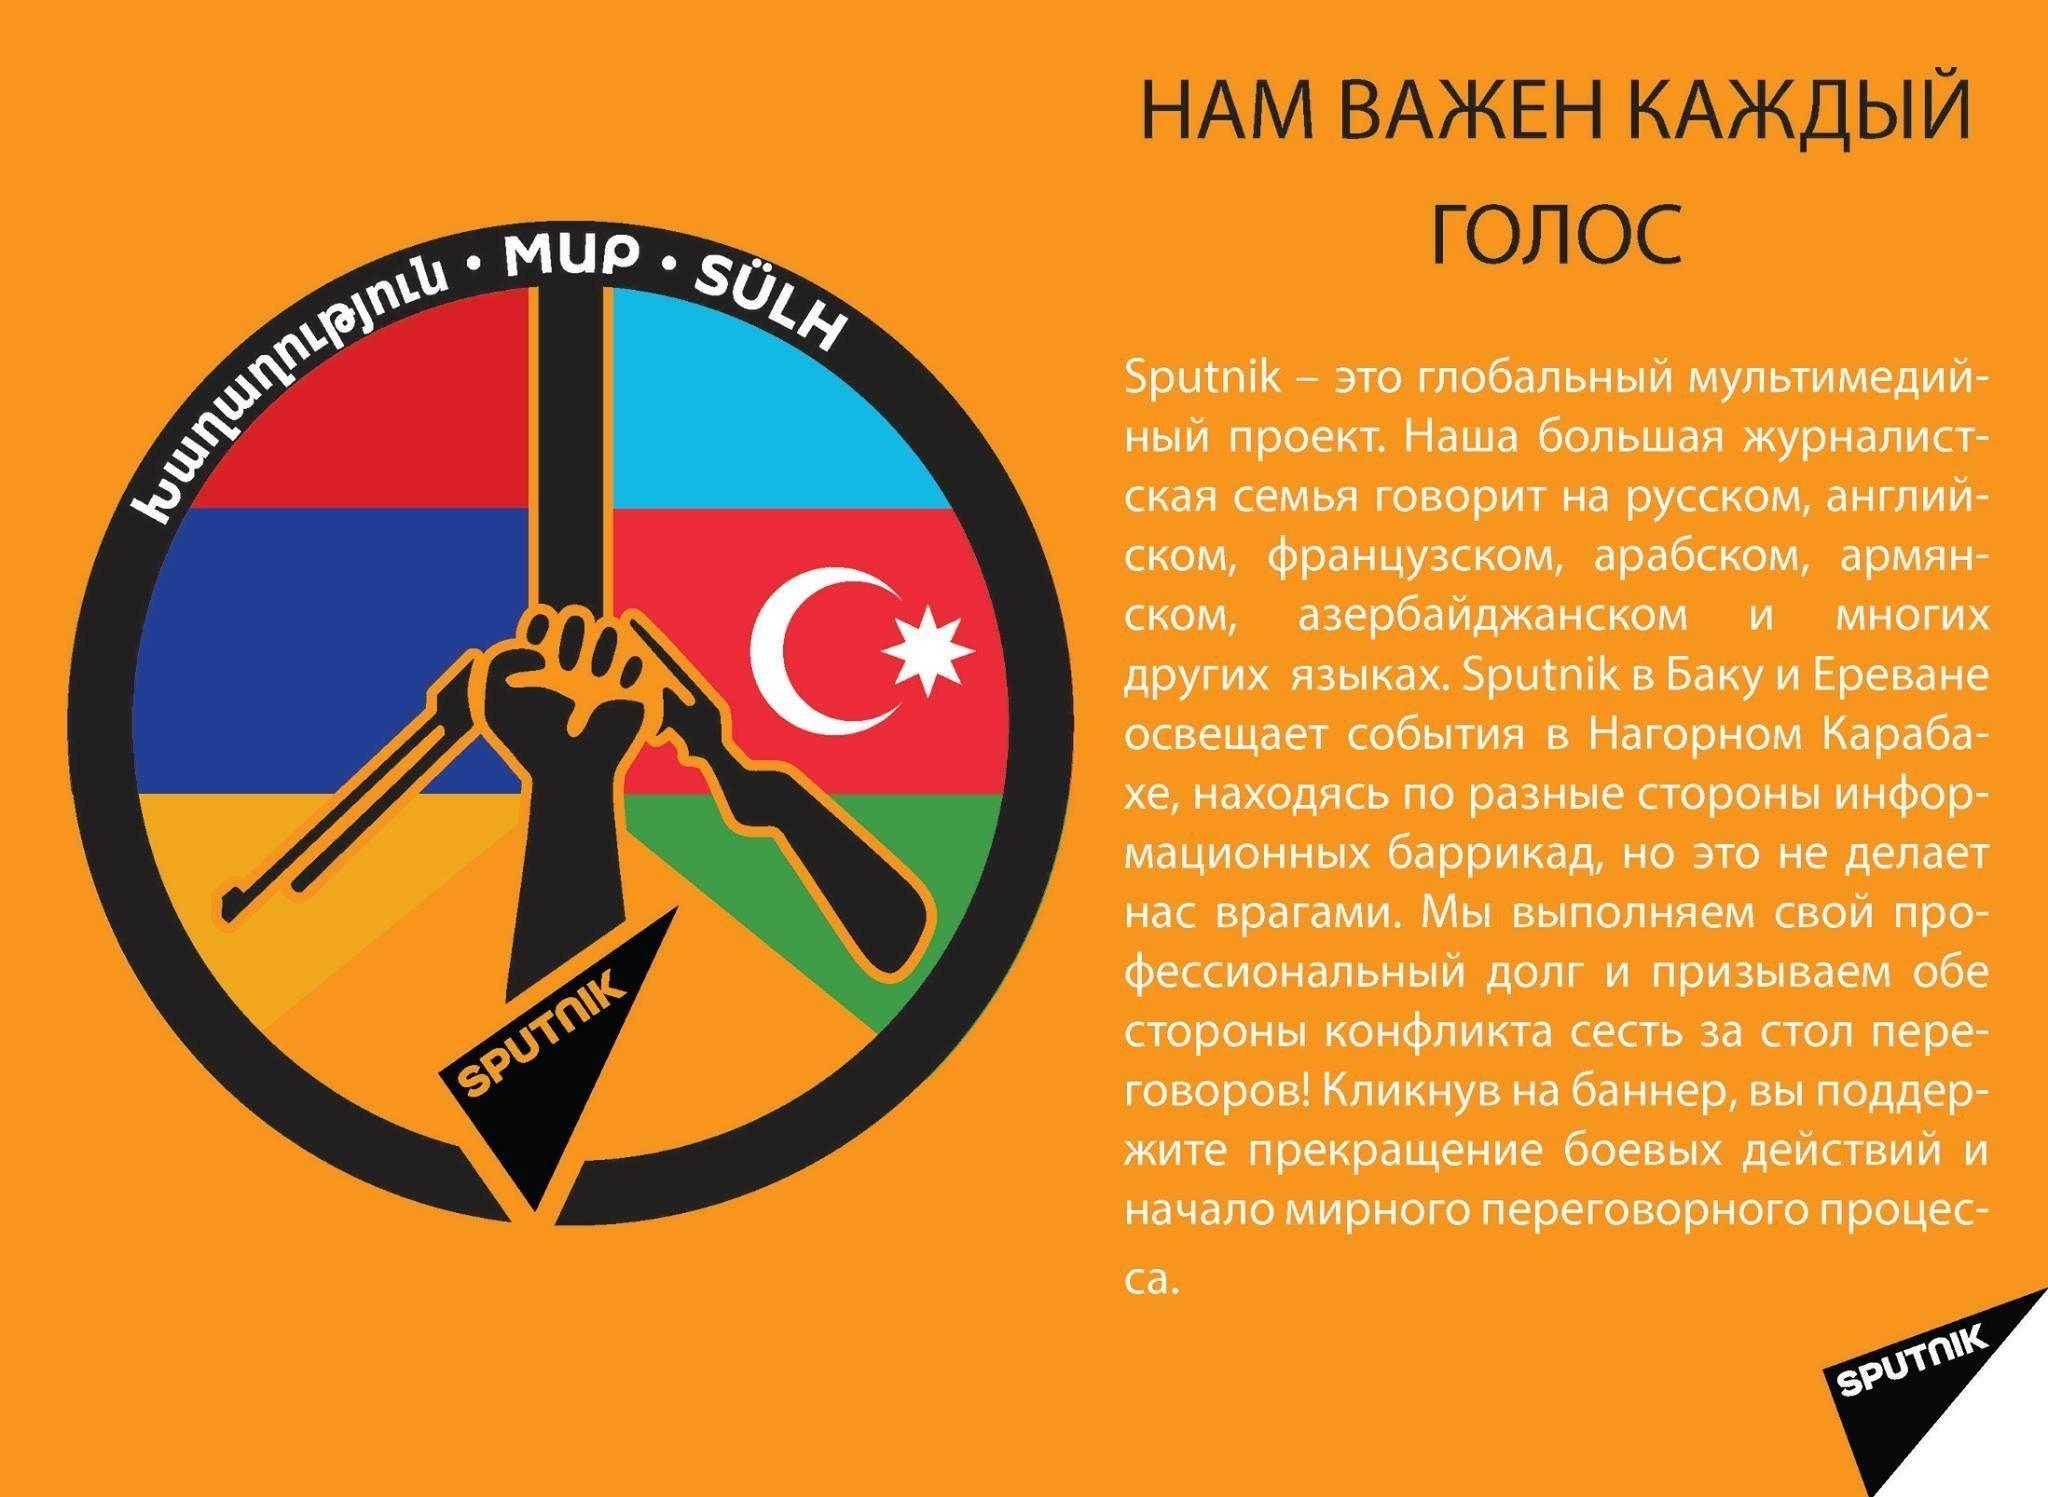 Banner criado para apoiar a paz no conflito de Nagorno-Karabakh: